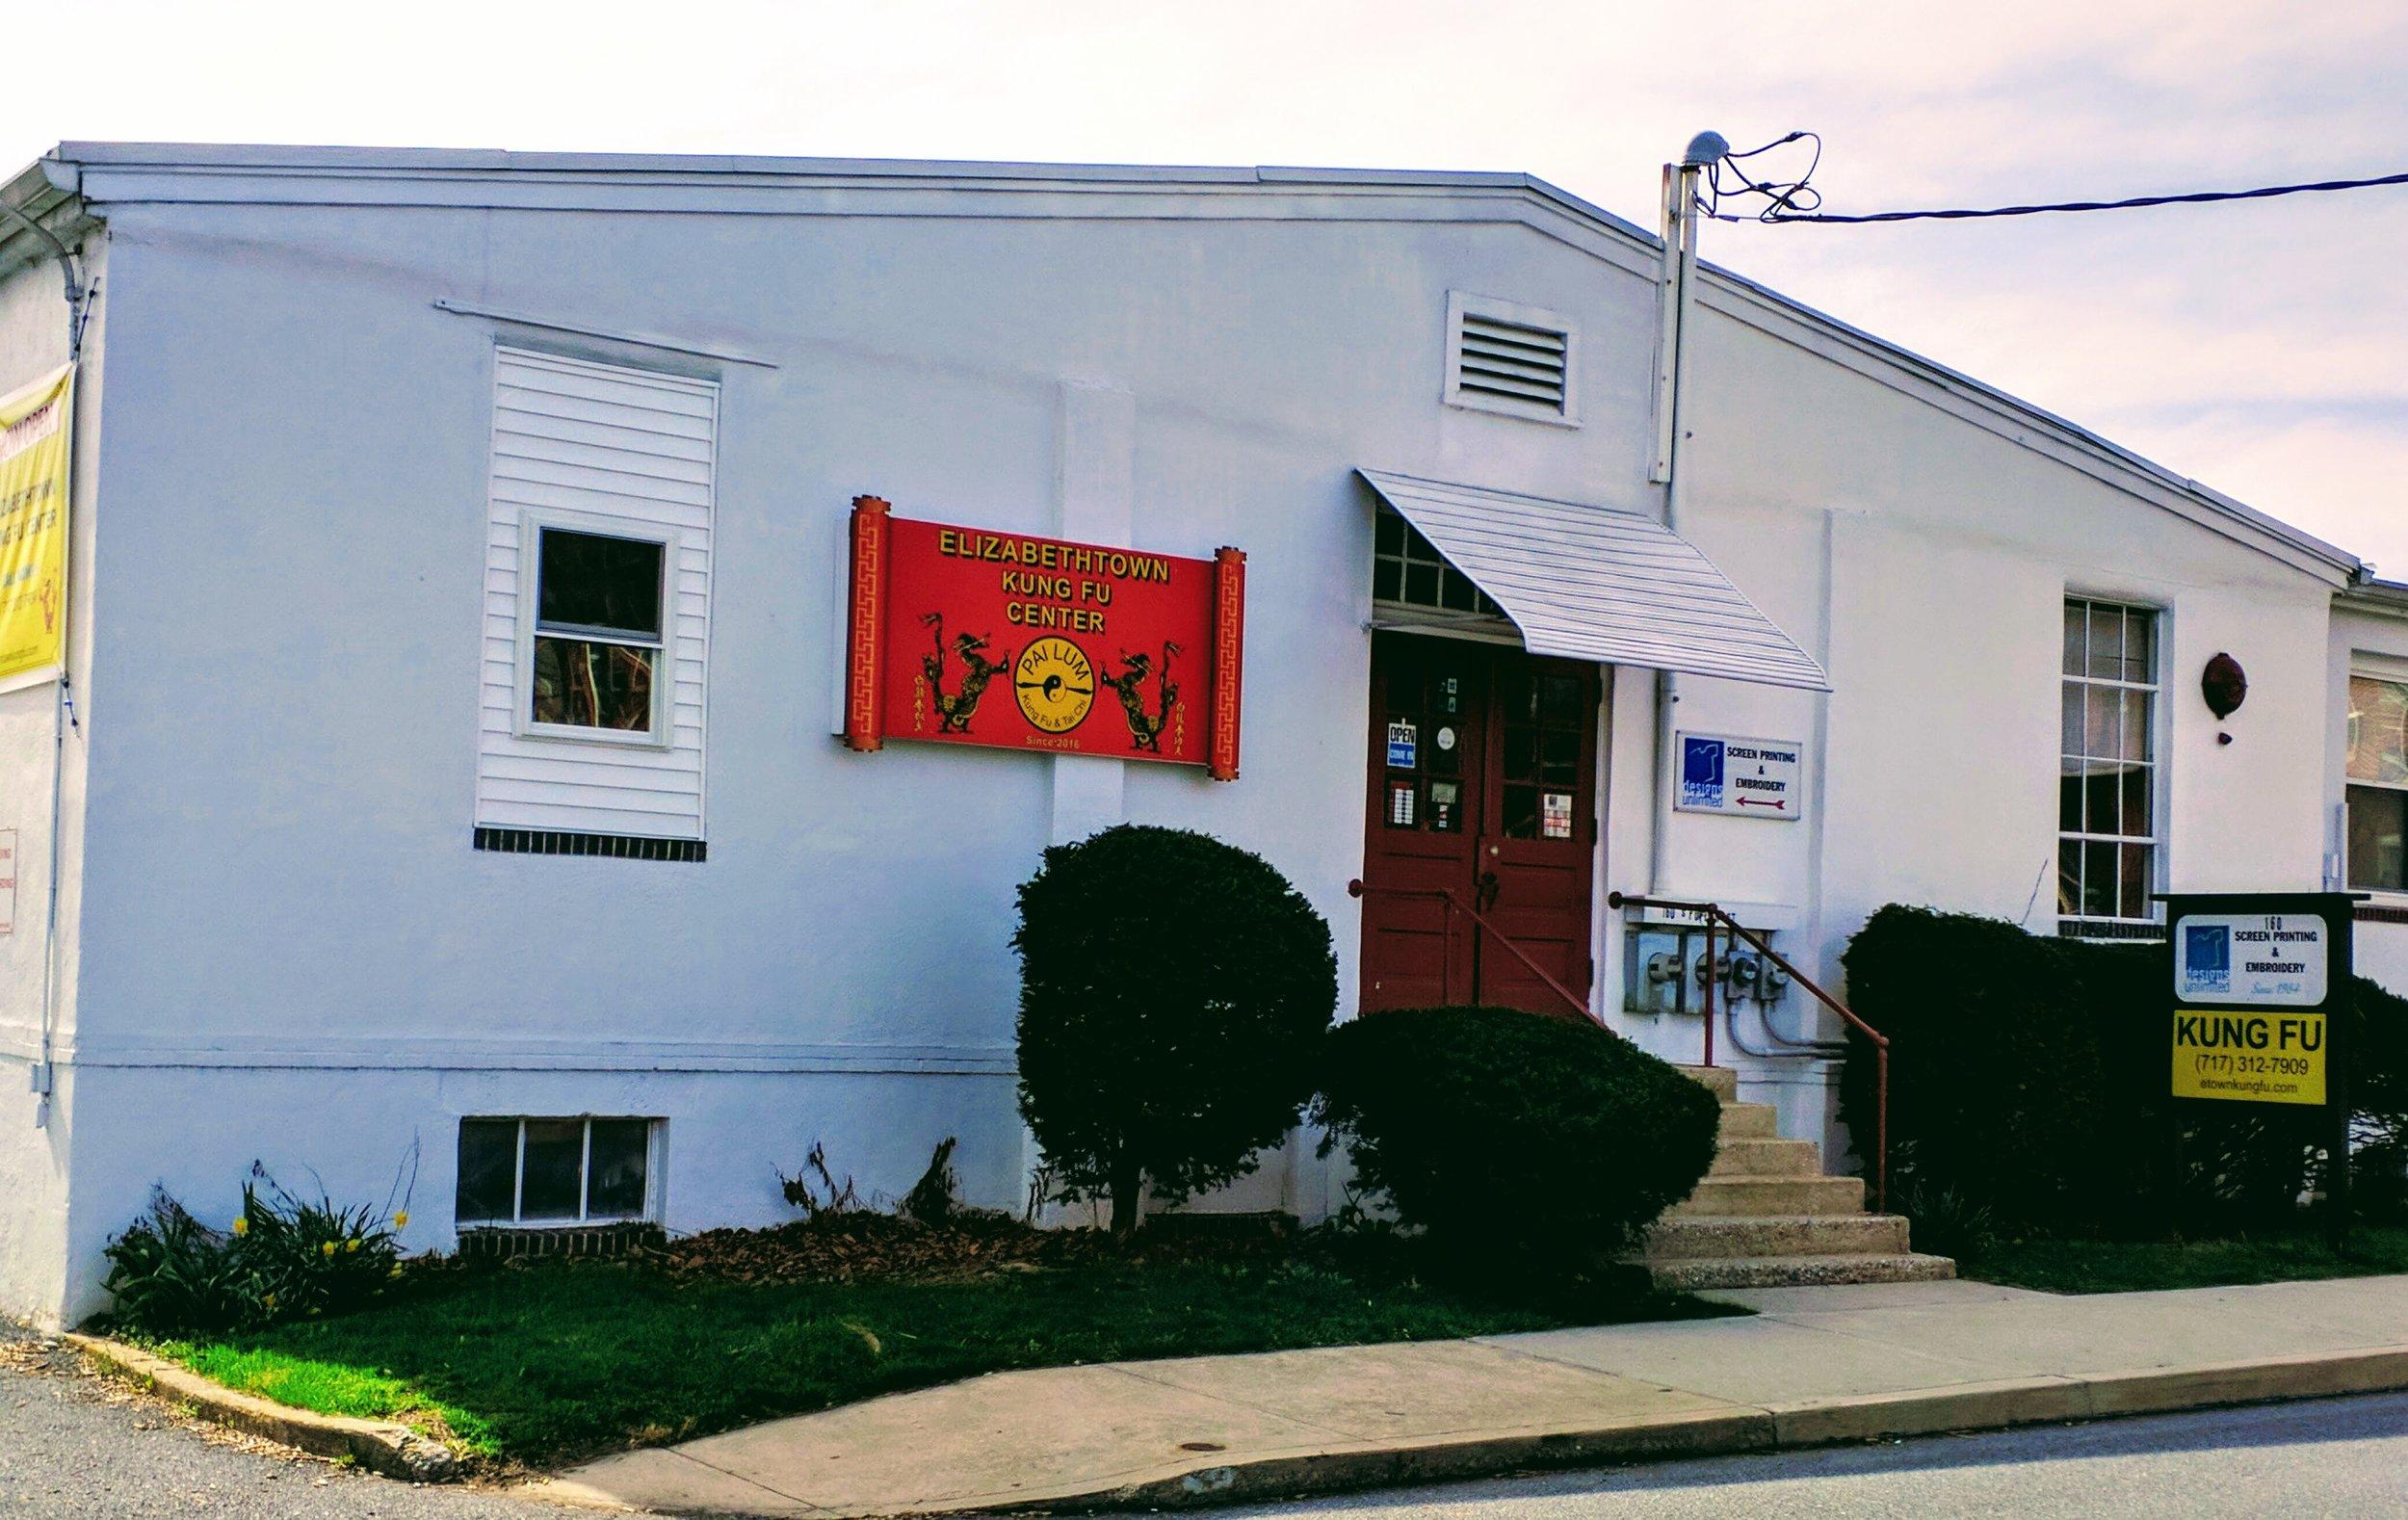 elizabethtown kung fu center / (717) 312-7909 / 160 s poplar street etown pa 17022